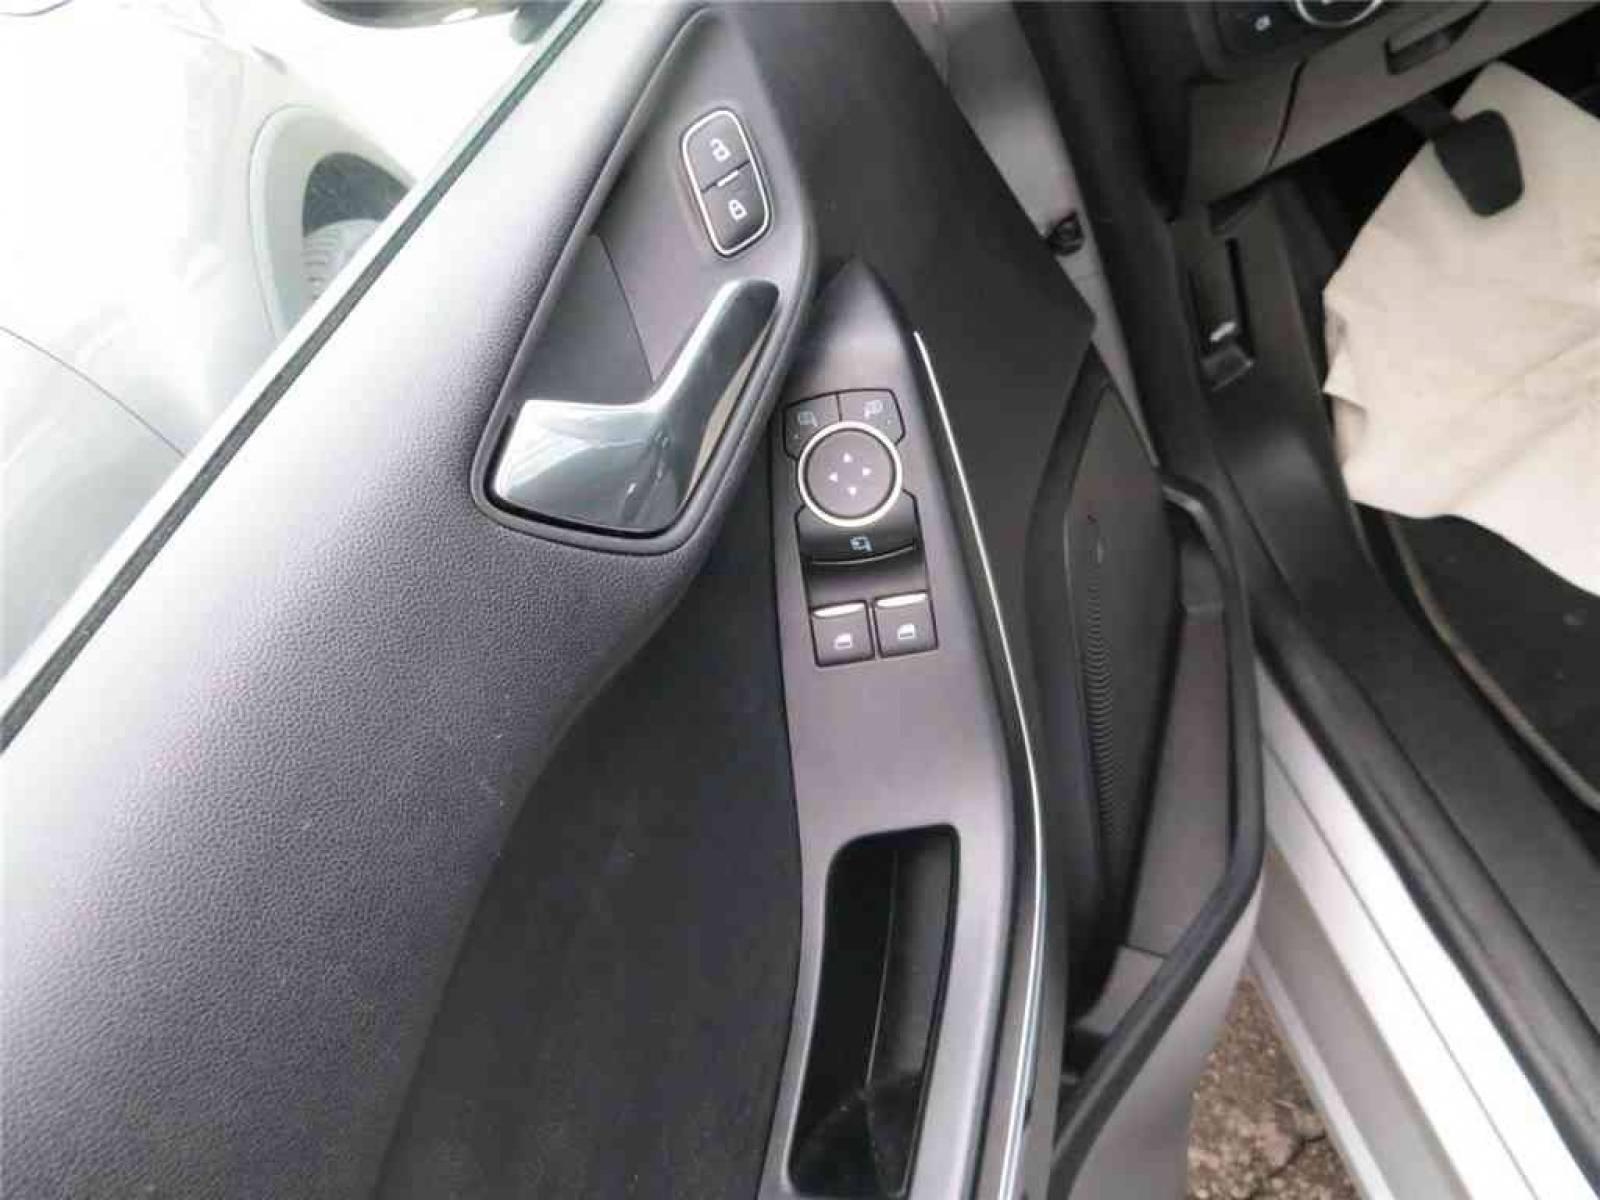 FORD Fiesta 1.0 EcoBoost 100 ch S&S BVM6 - véhicule d'occasion - Groupe Guillet - Opel Magicauto - Chalon-sur-Saône - 71380 - Saint-Marcel - 11